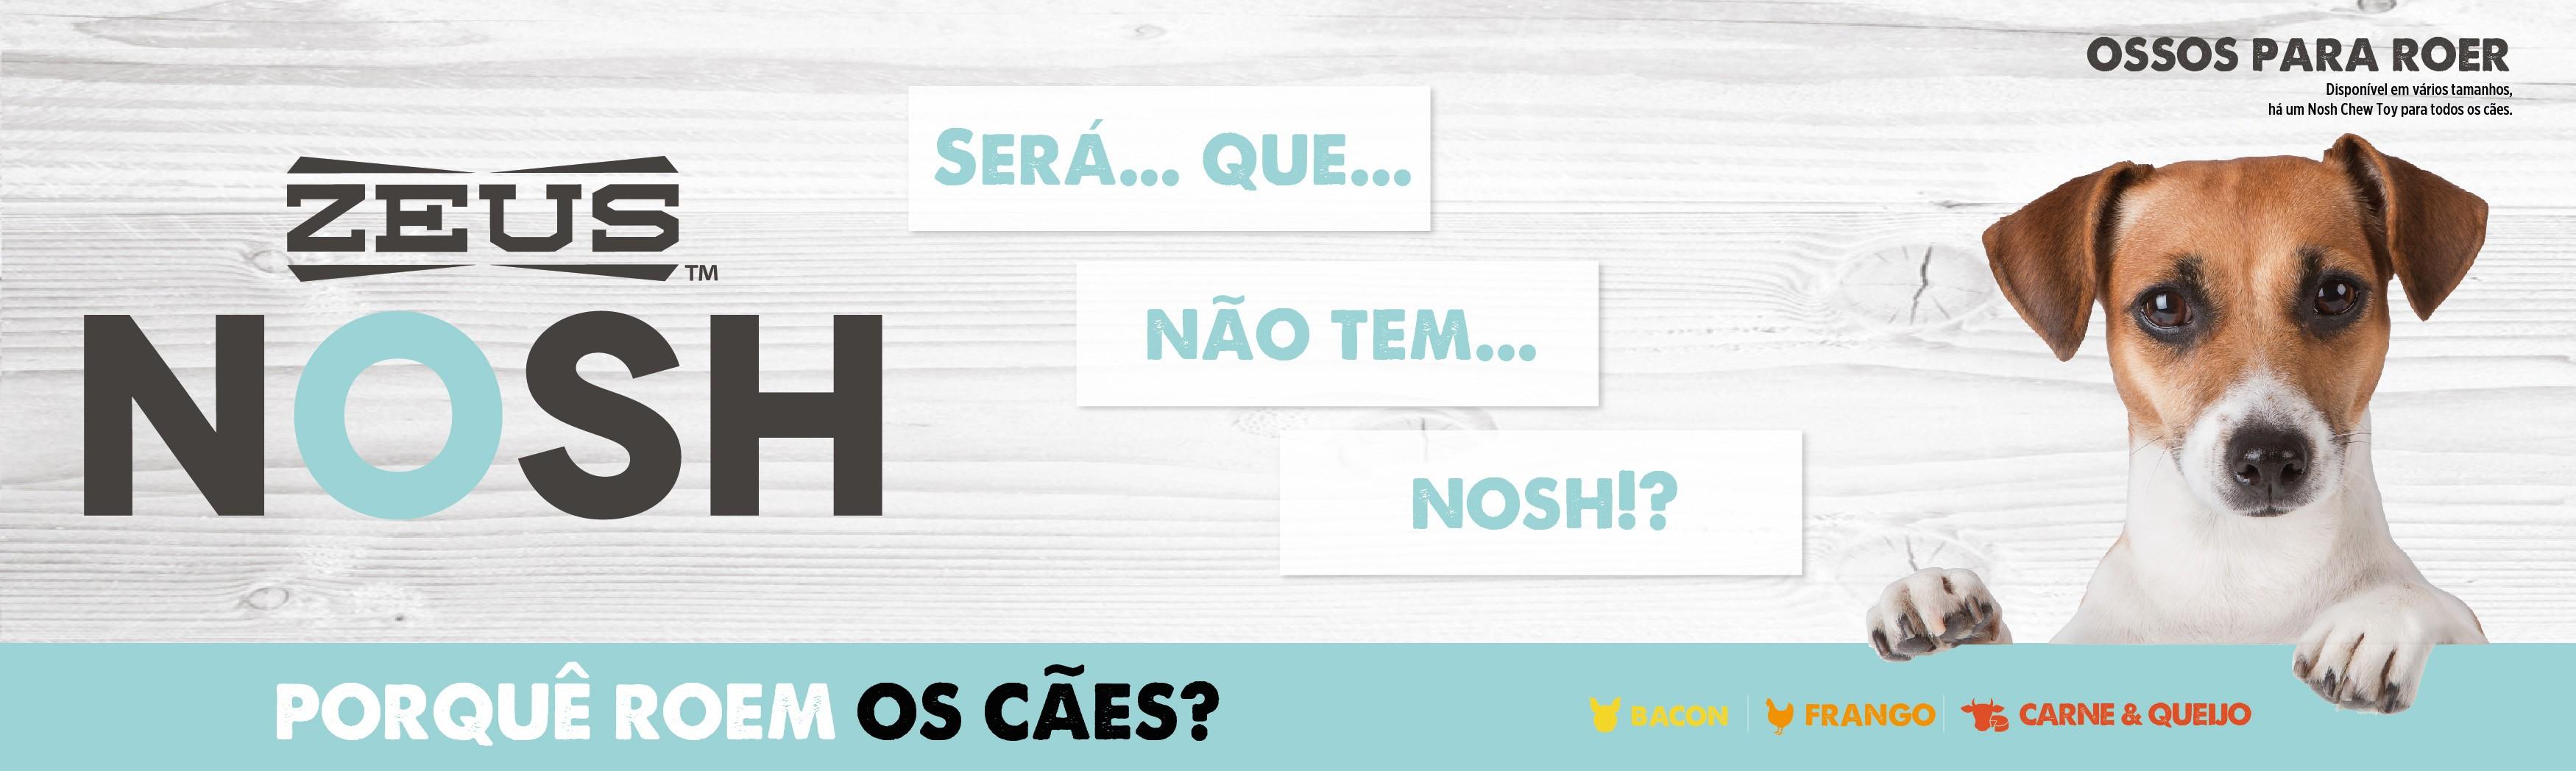 NOSH ZEUS